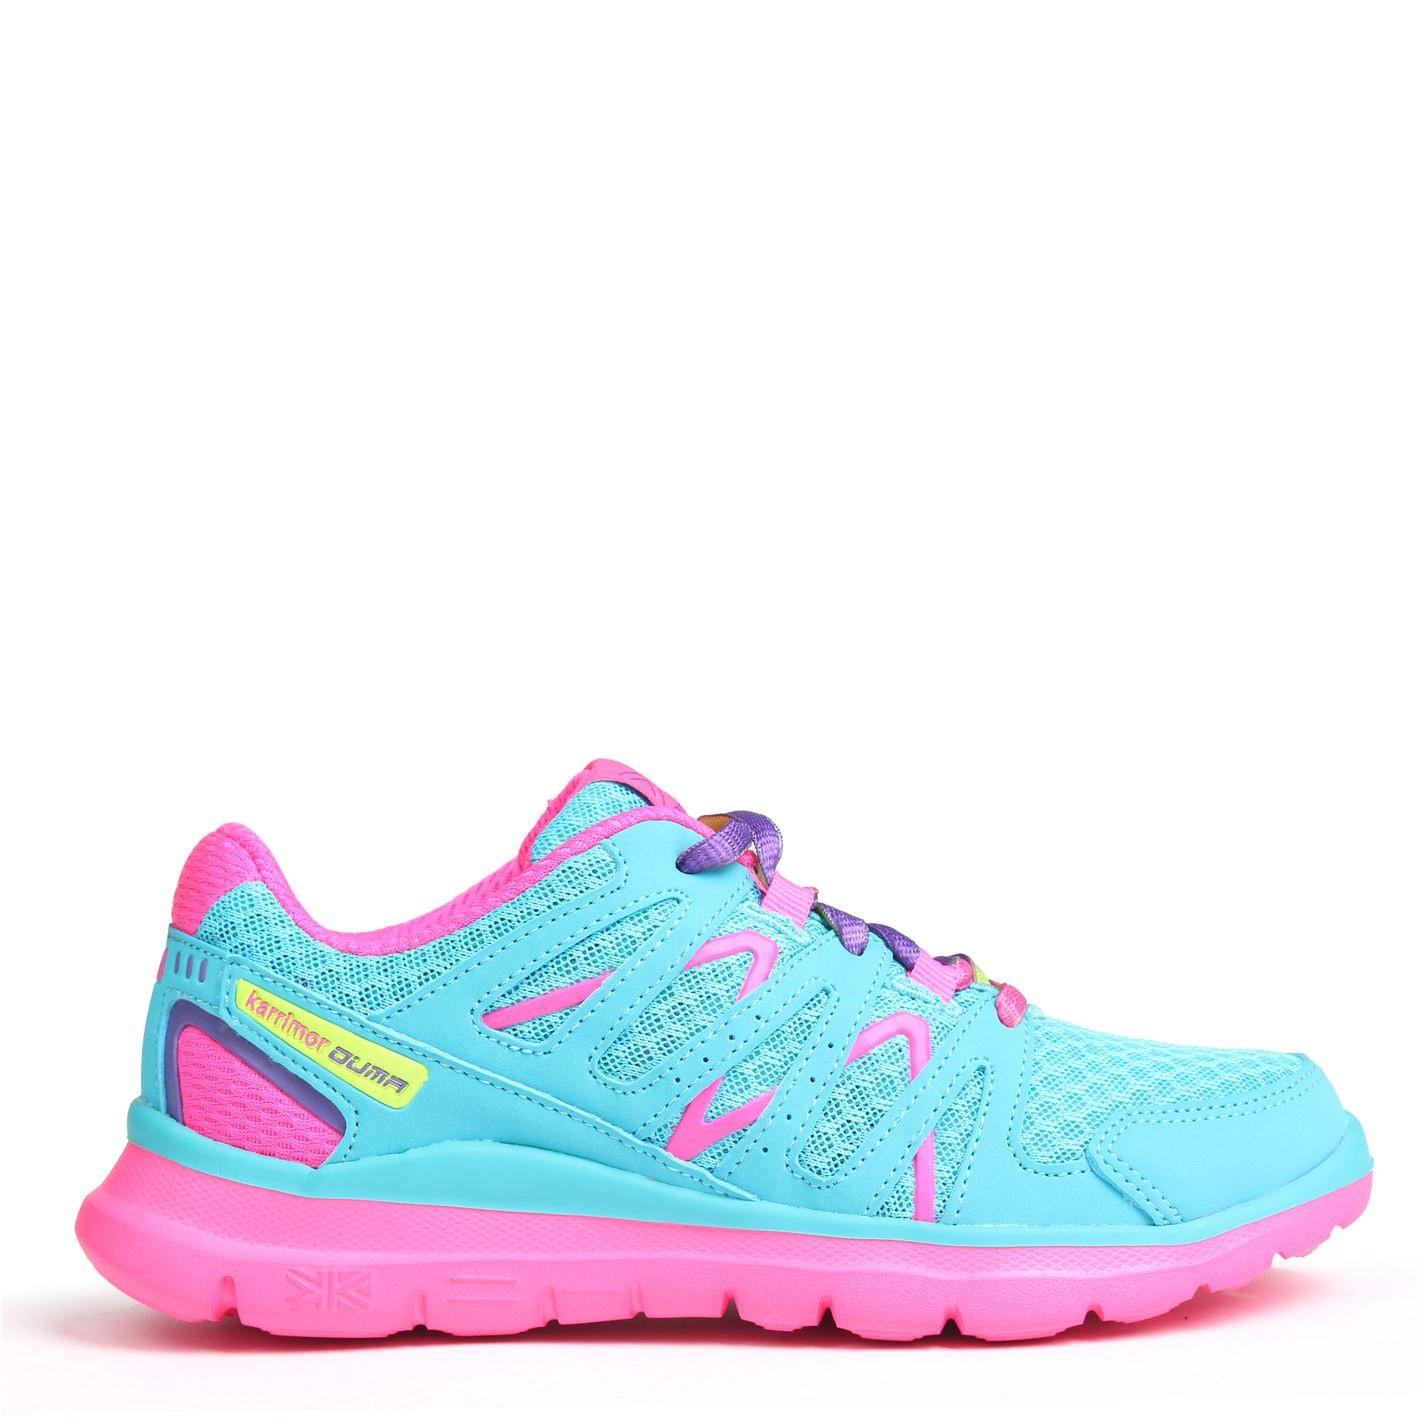 Adidasi sport Karrimor Duma Child pentru fete bleu roz